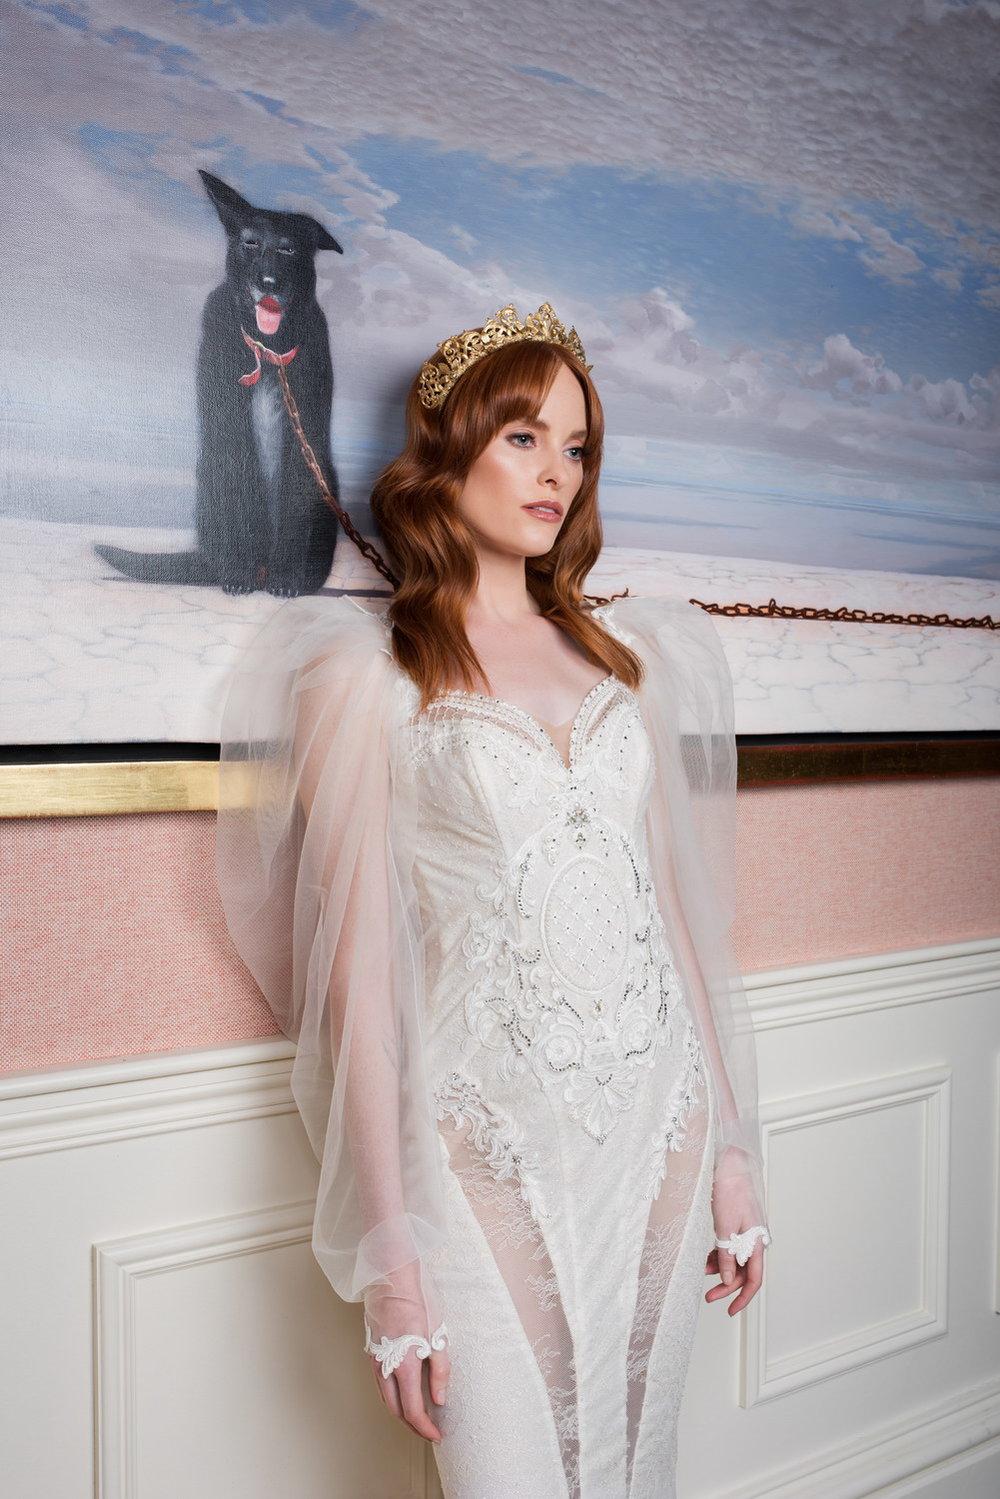 Viktoria-Novak-Immortal-Renaissance-2018-shoot-Hopewood-House5-KarenWoo15.jpg